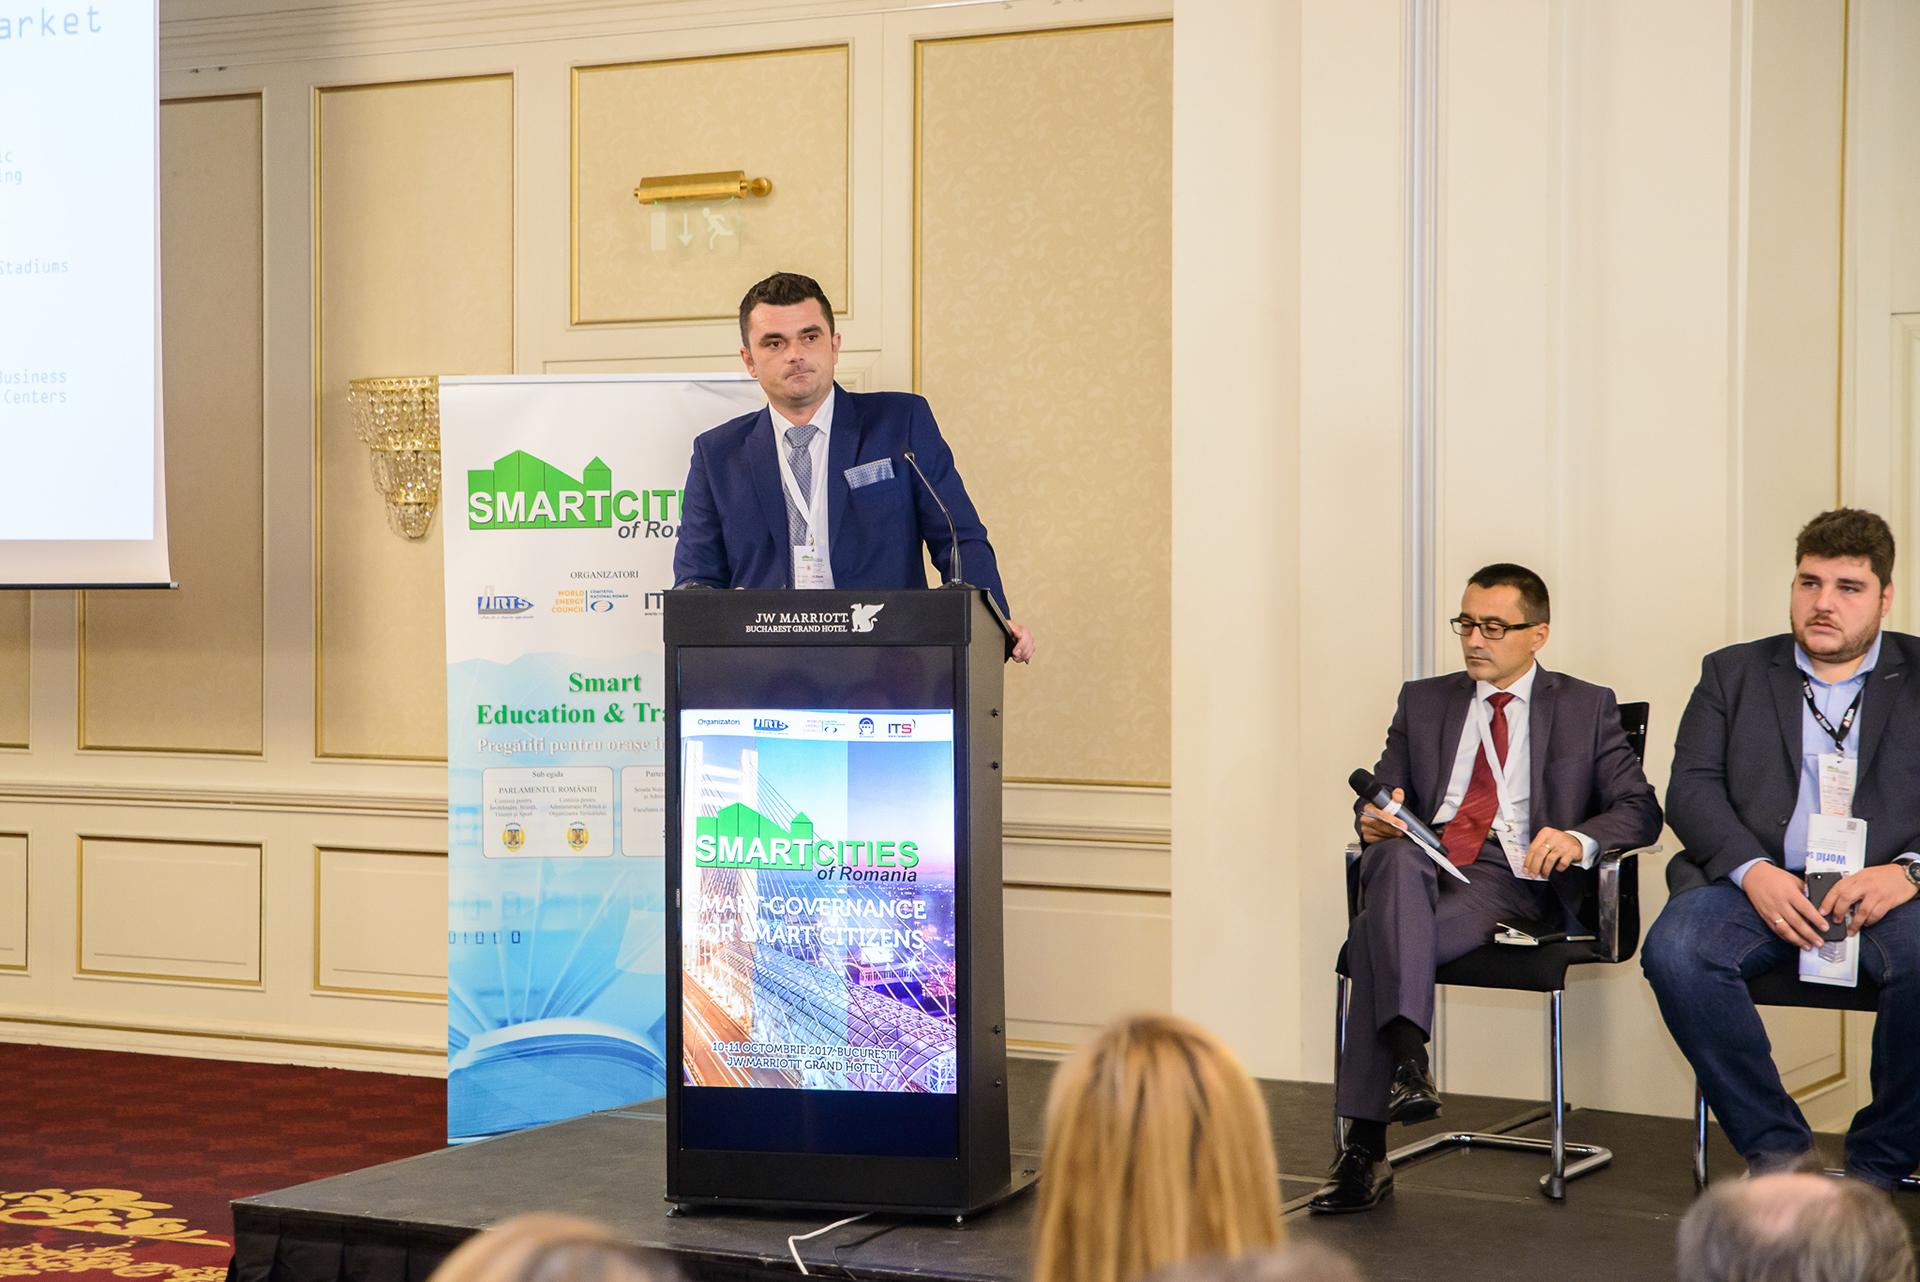 Smart-Cities-Of-Romania-2017---ITS-507